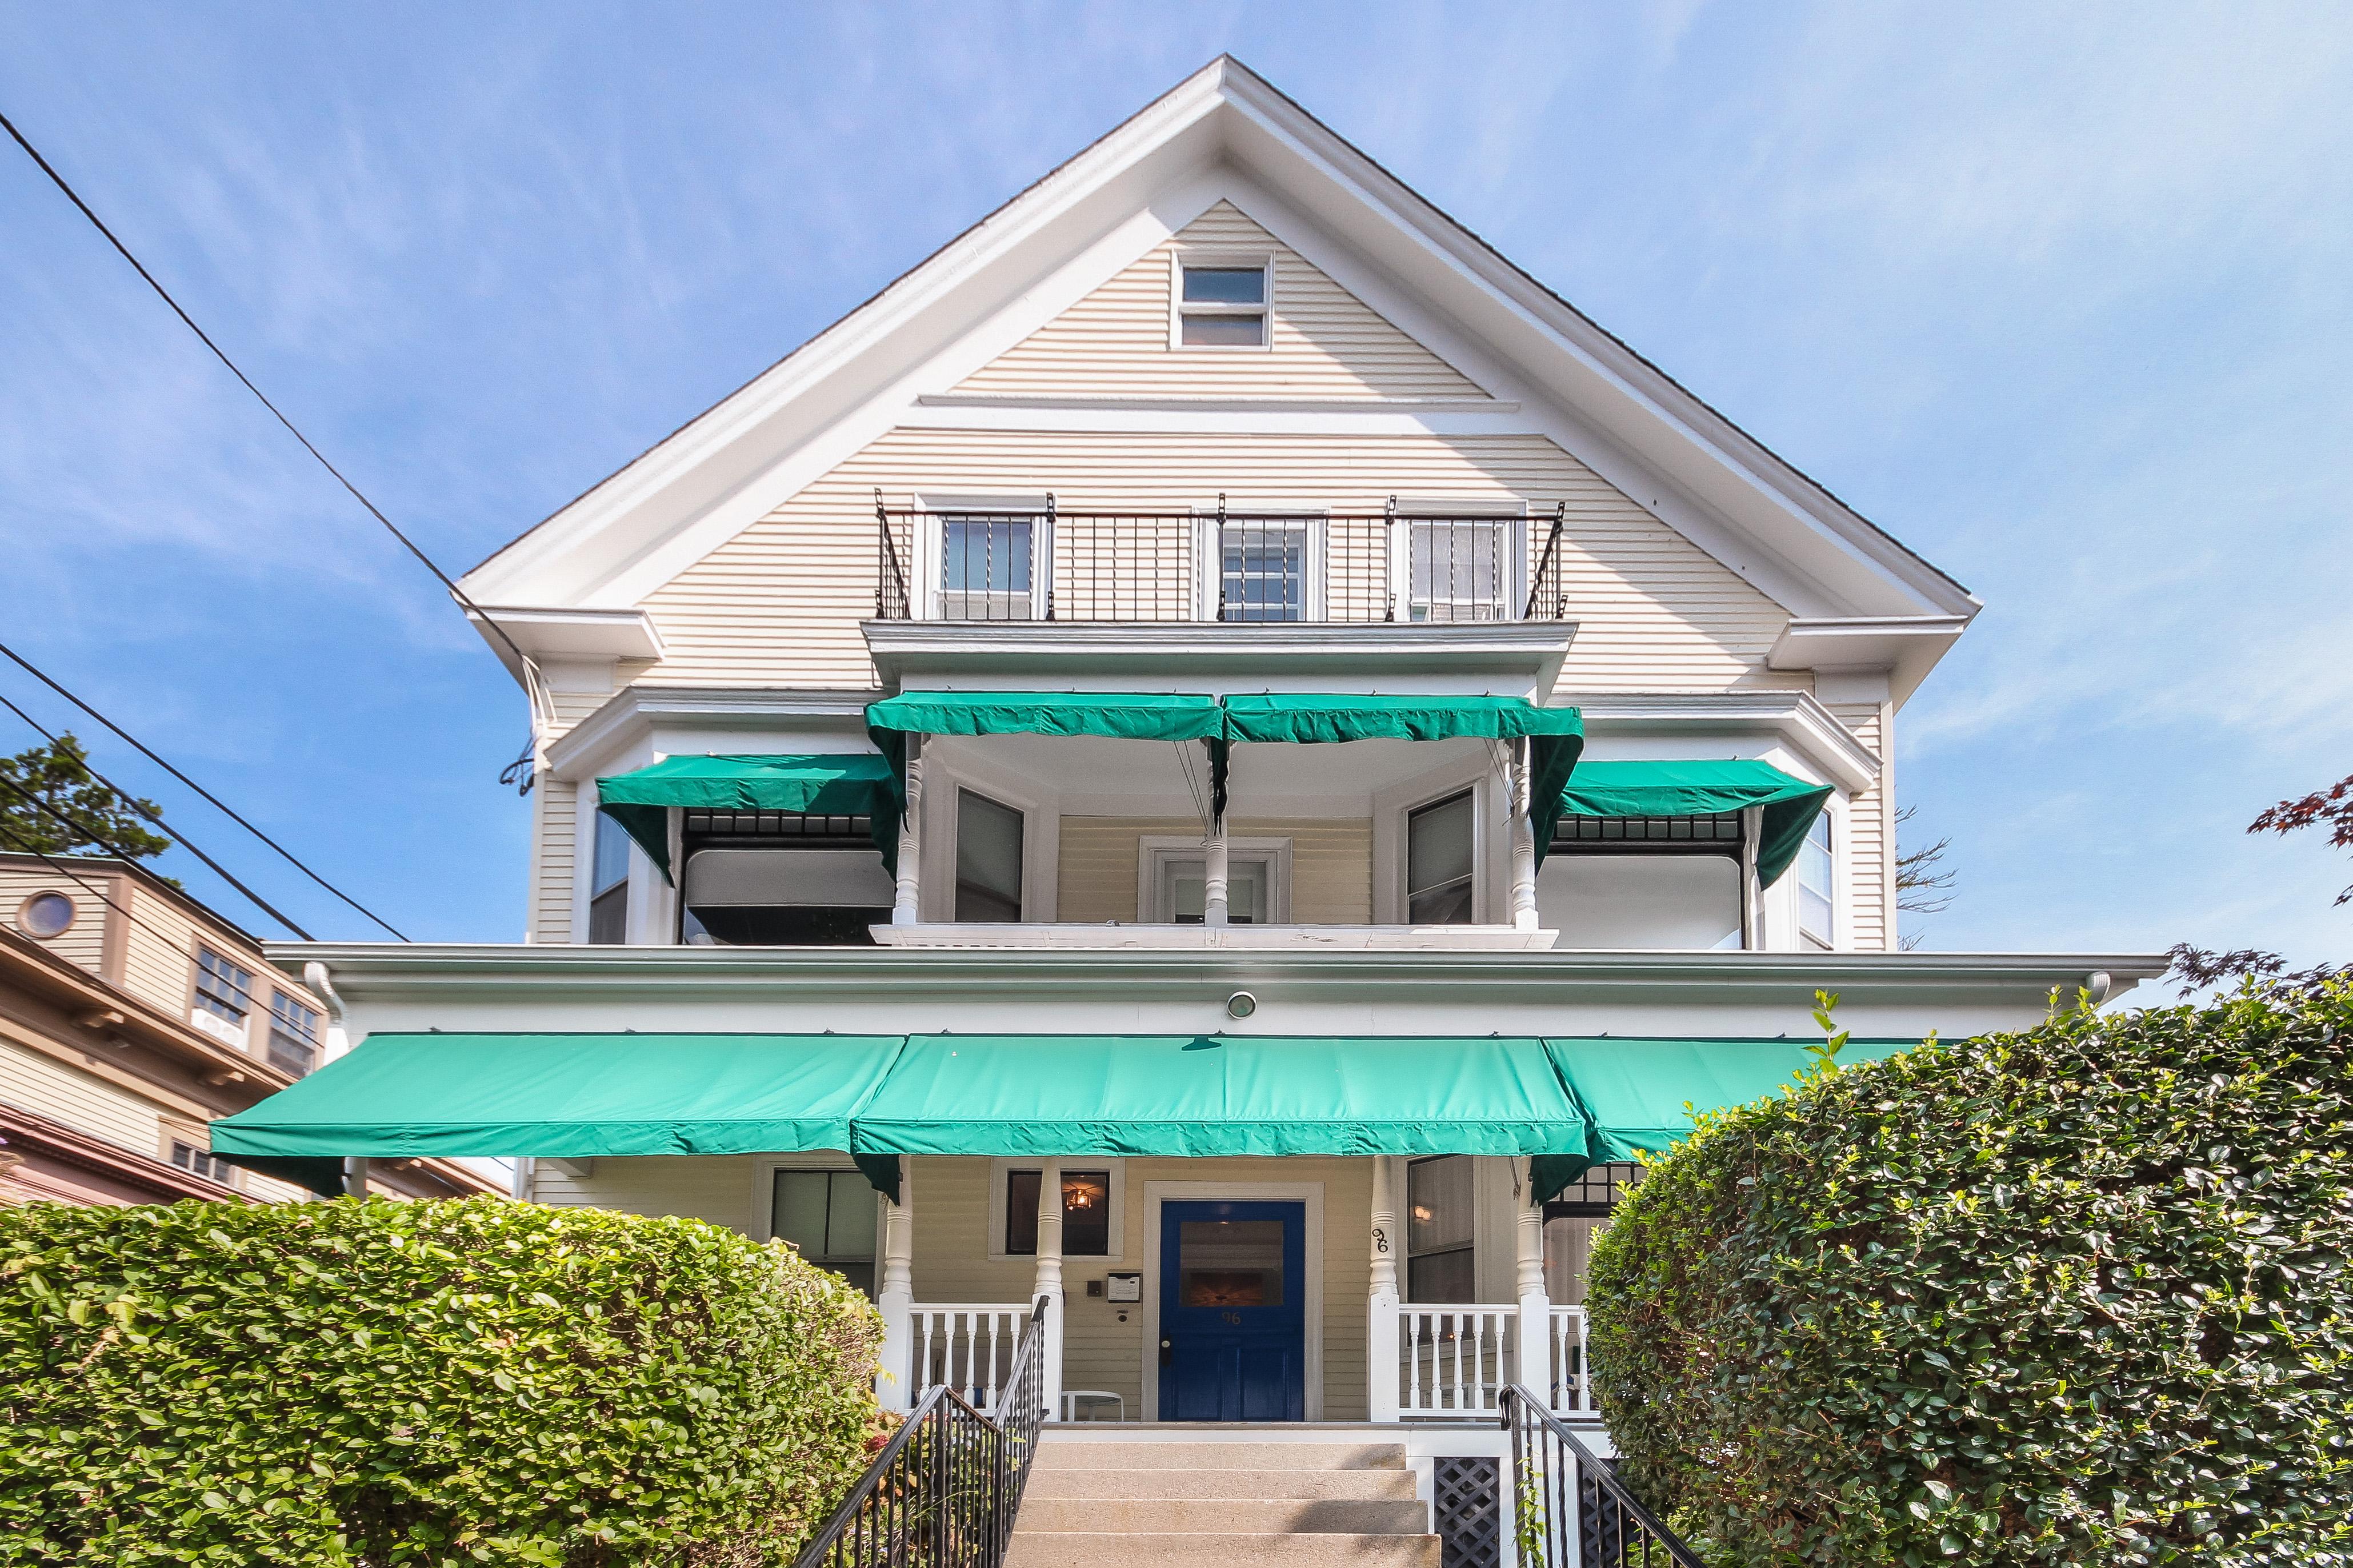 newport blues inn black duck inn sell for combined price. Black Bedroom Furniture Sets. Home Design Ideas